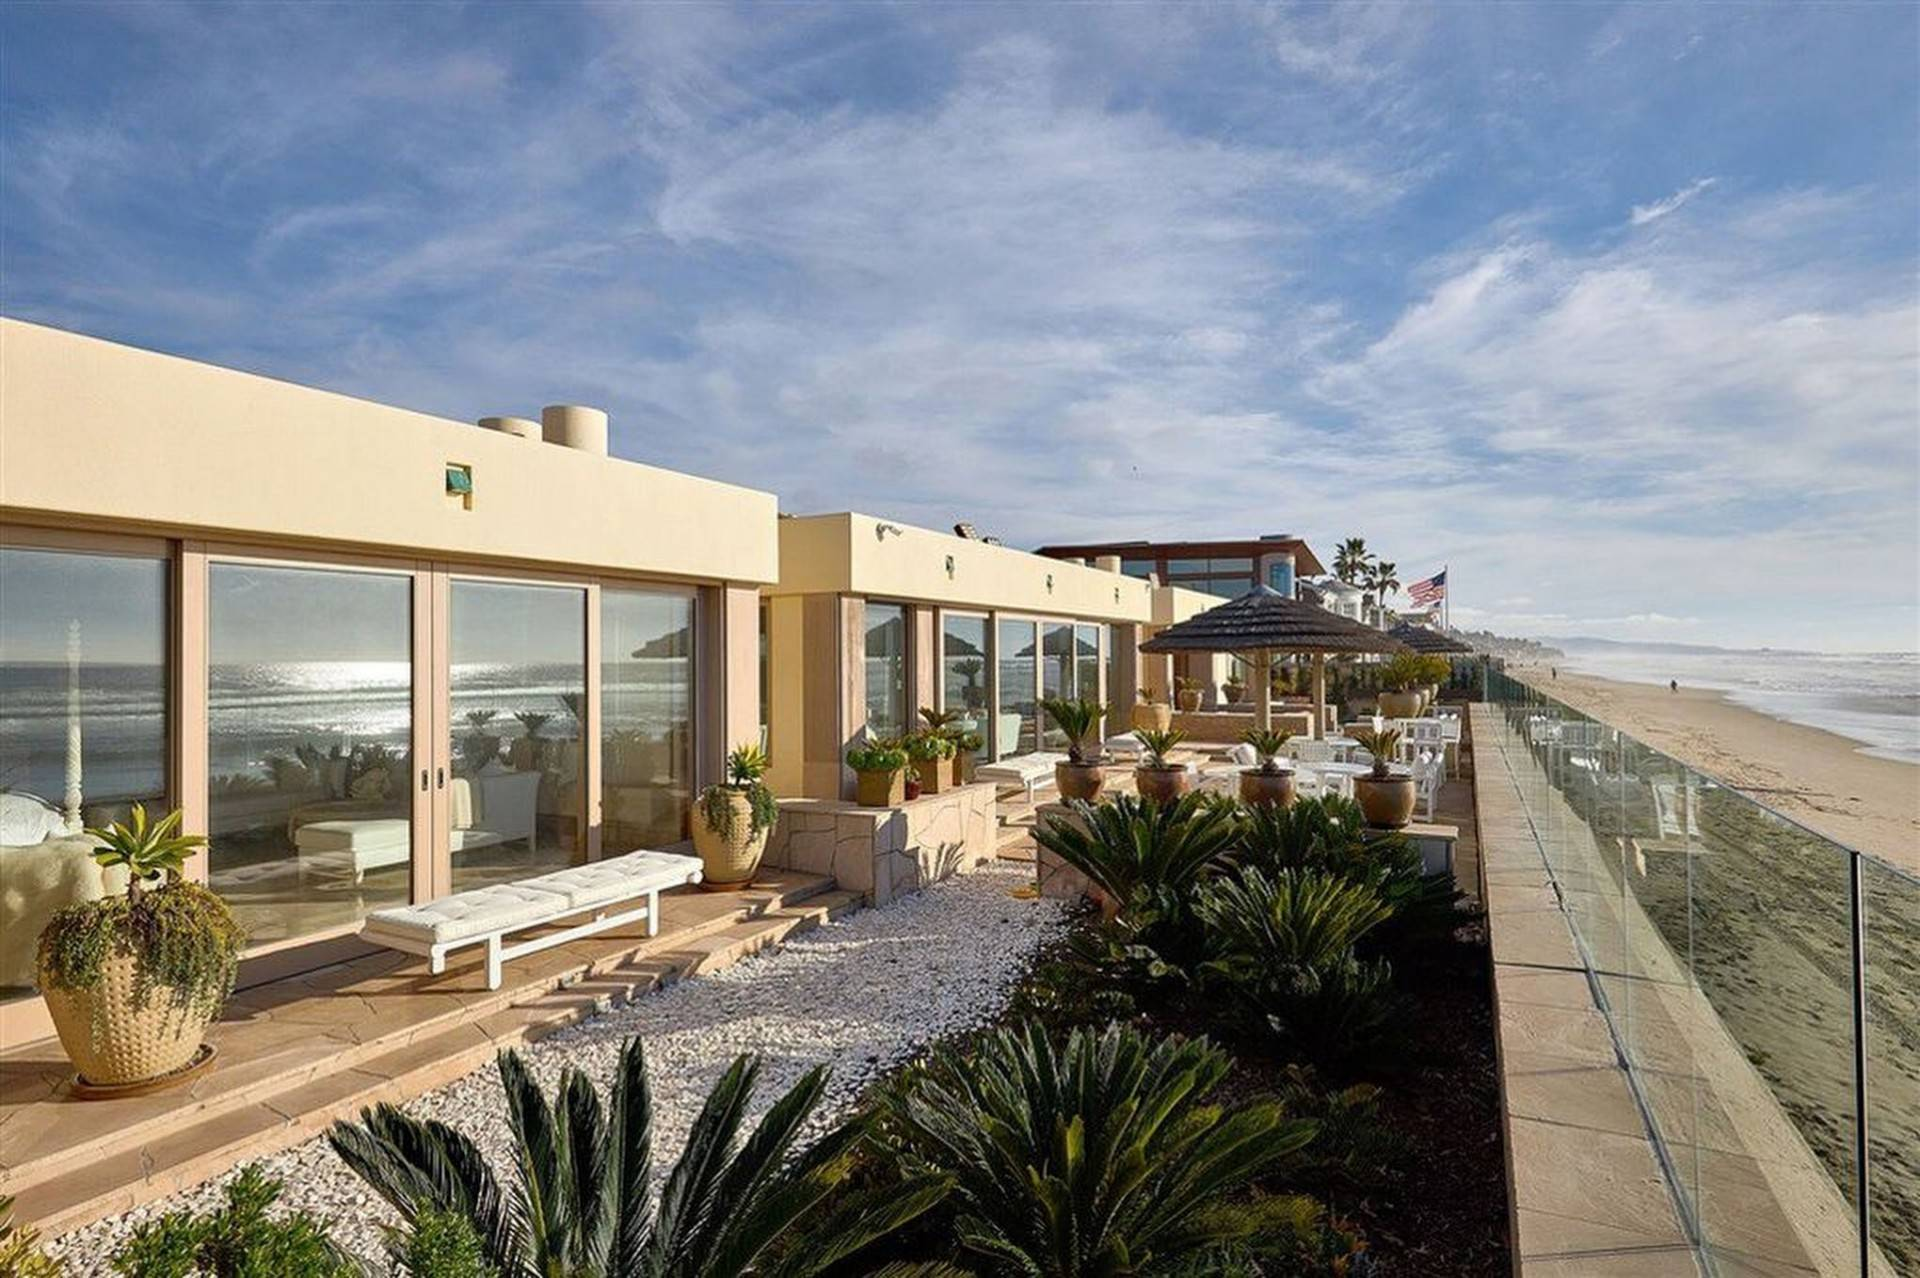 Nowa willa Billa i Melinda Gates niedaleko Los Angeles